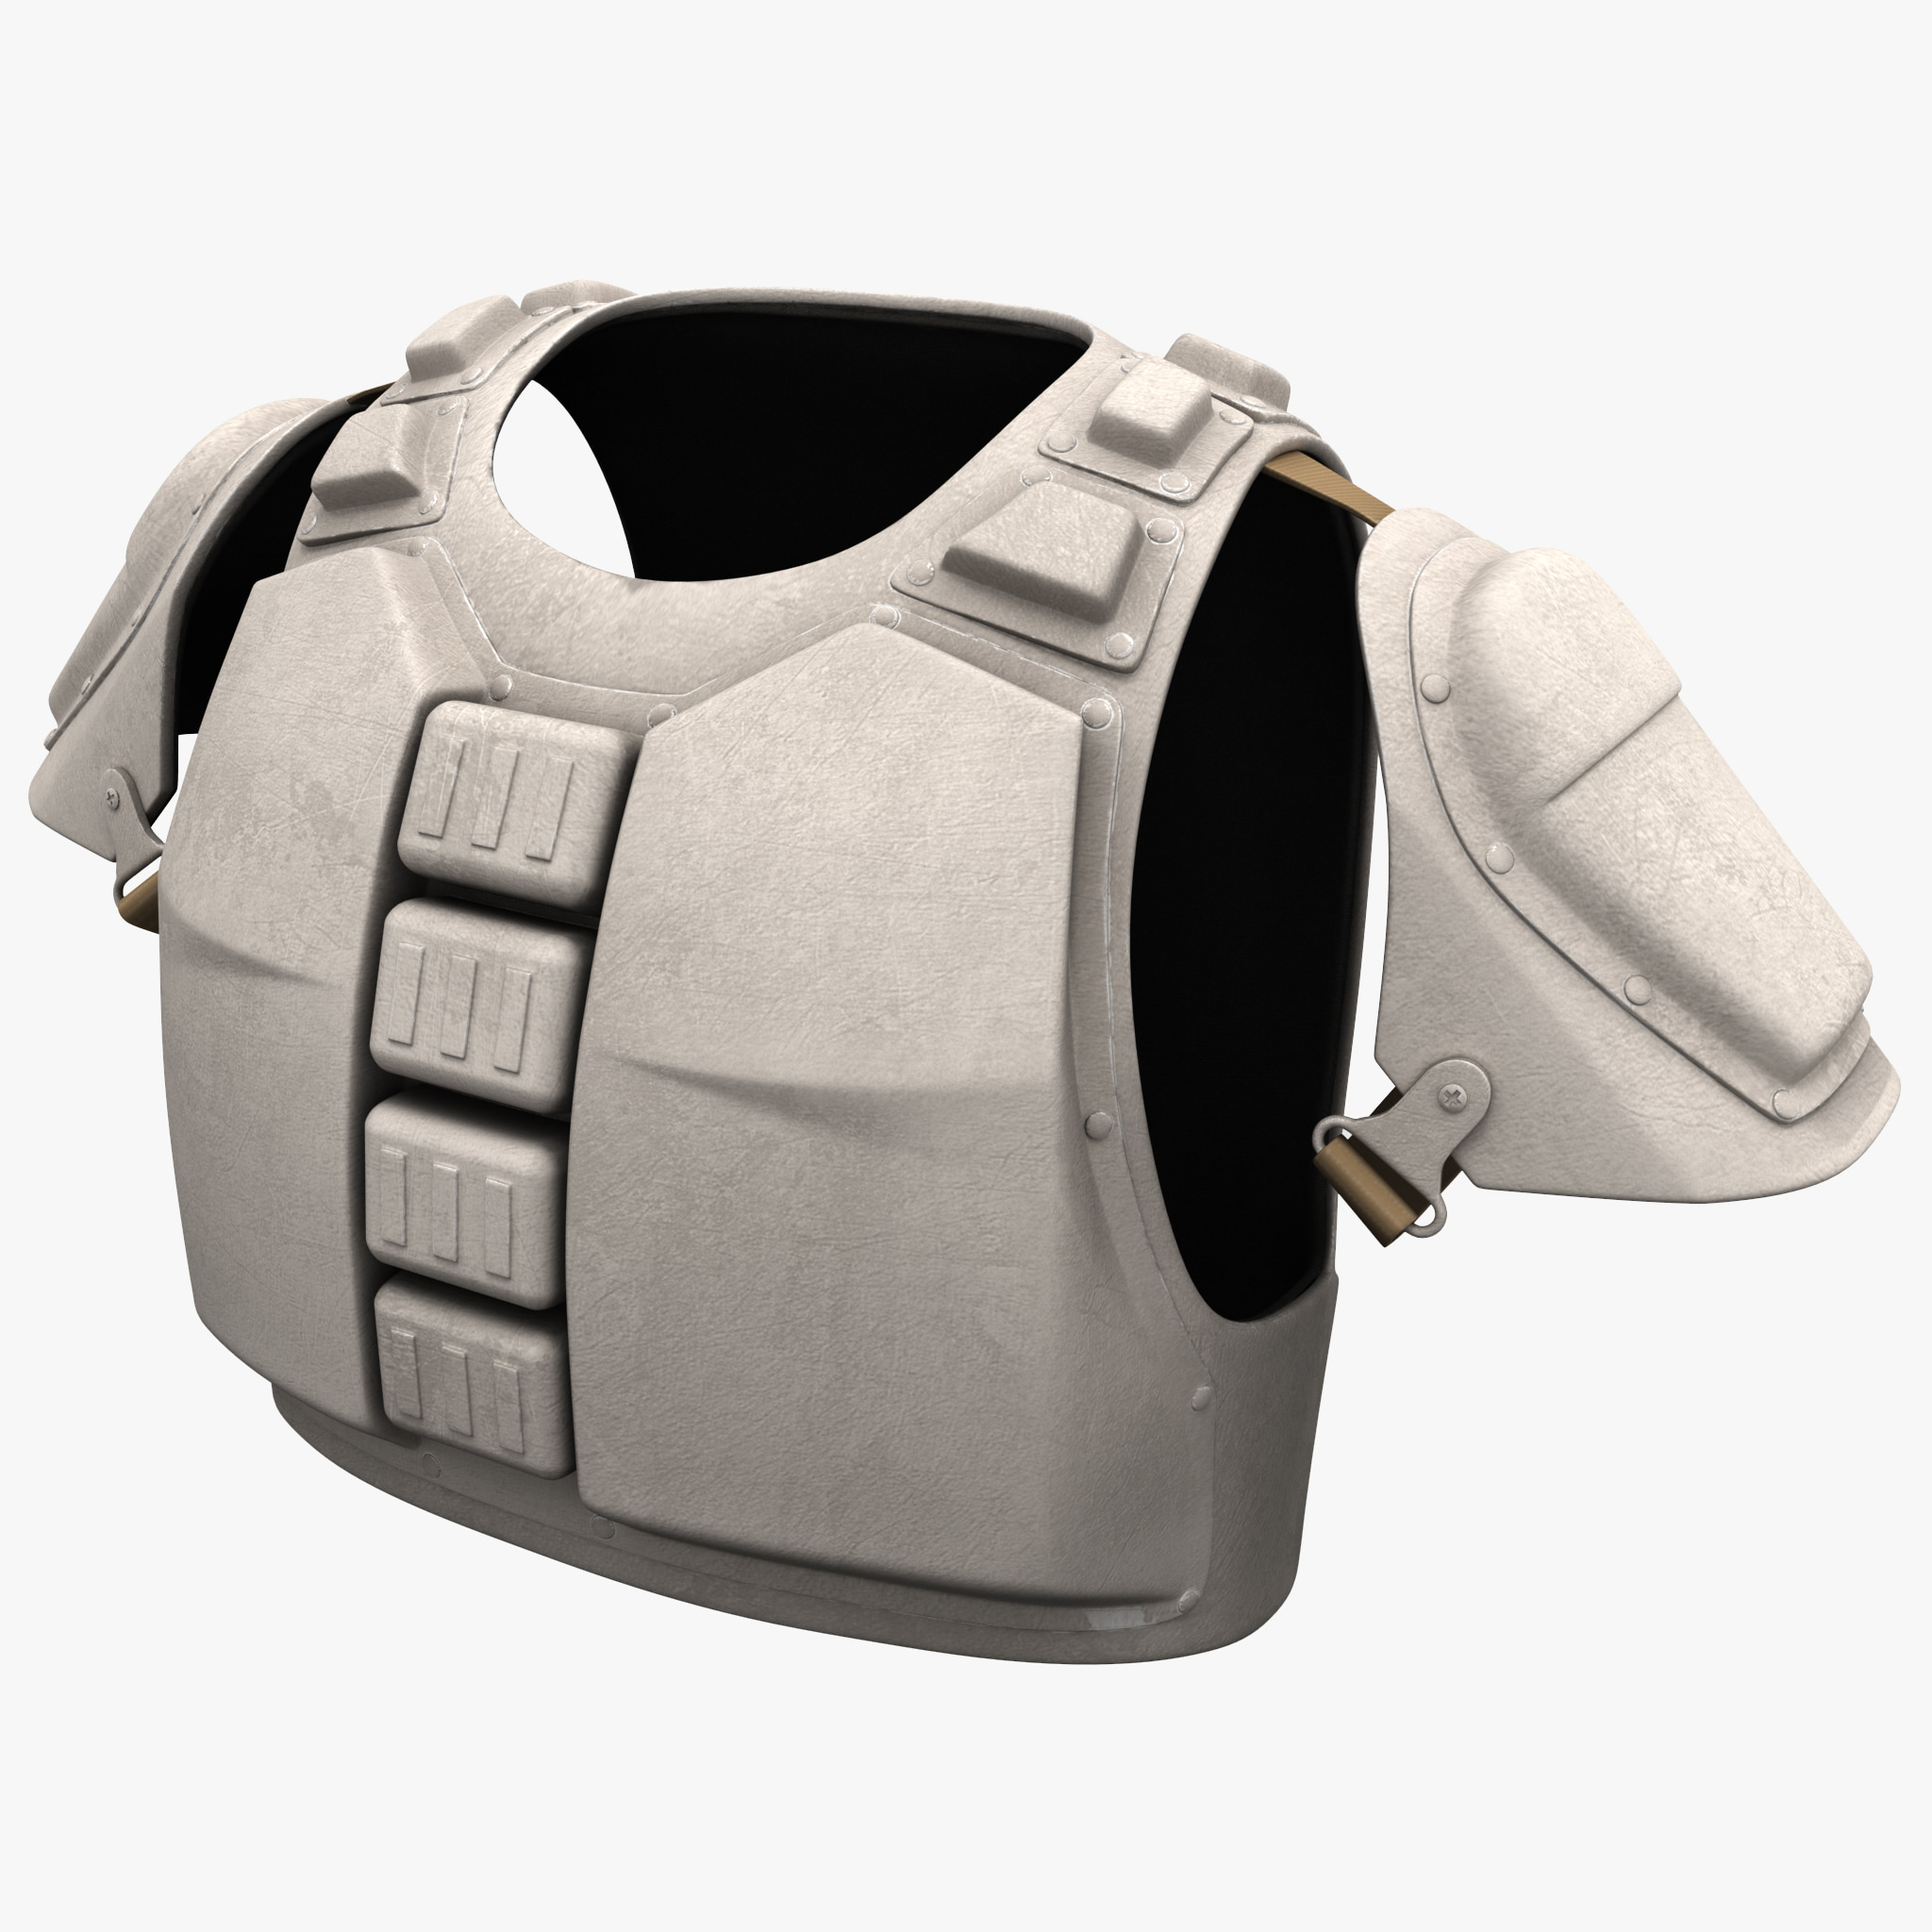 Futuristic Solider Armor_1.jpg